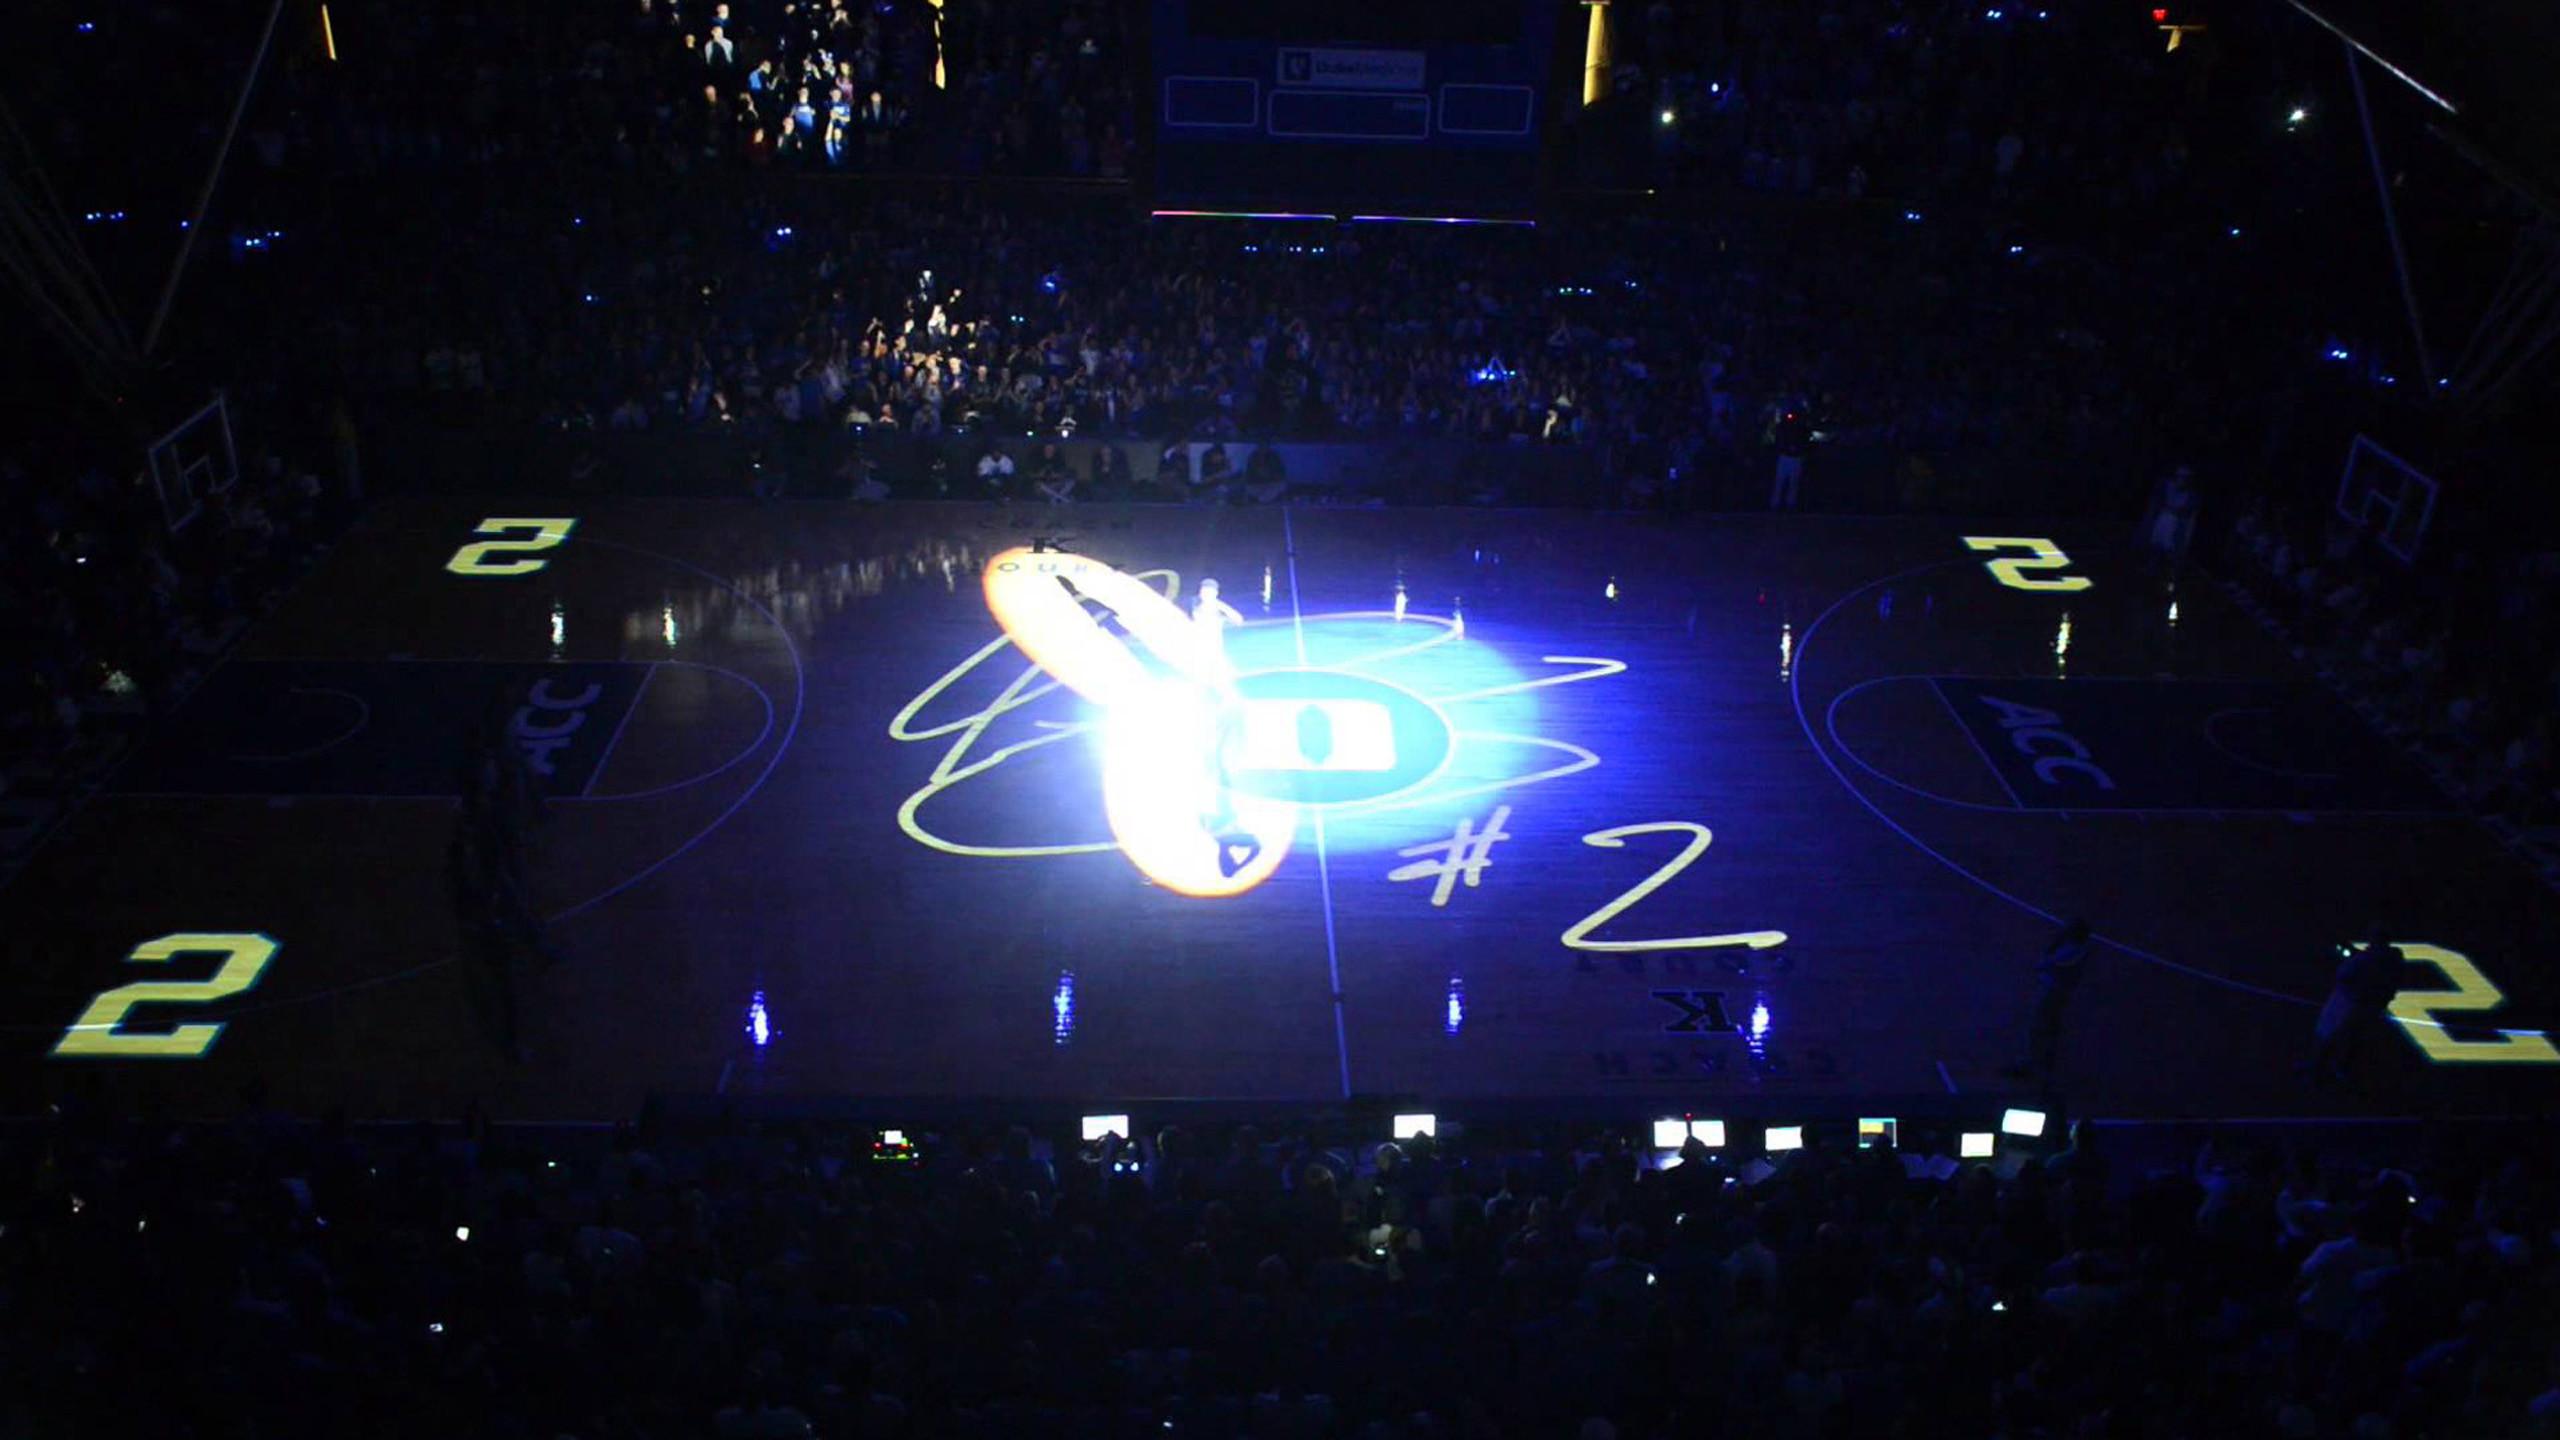 Duke basketball desktop wallpaper, HD Desktop Wallpapers